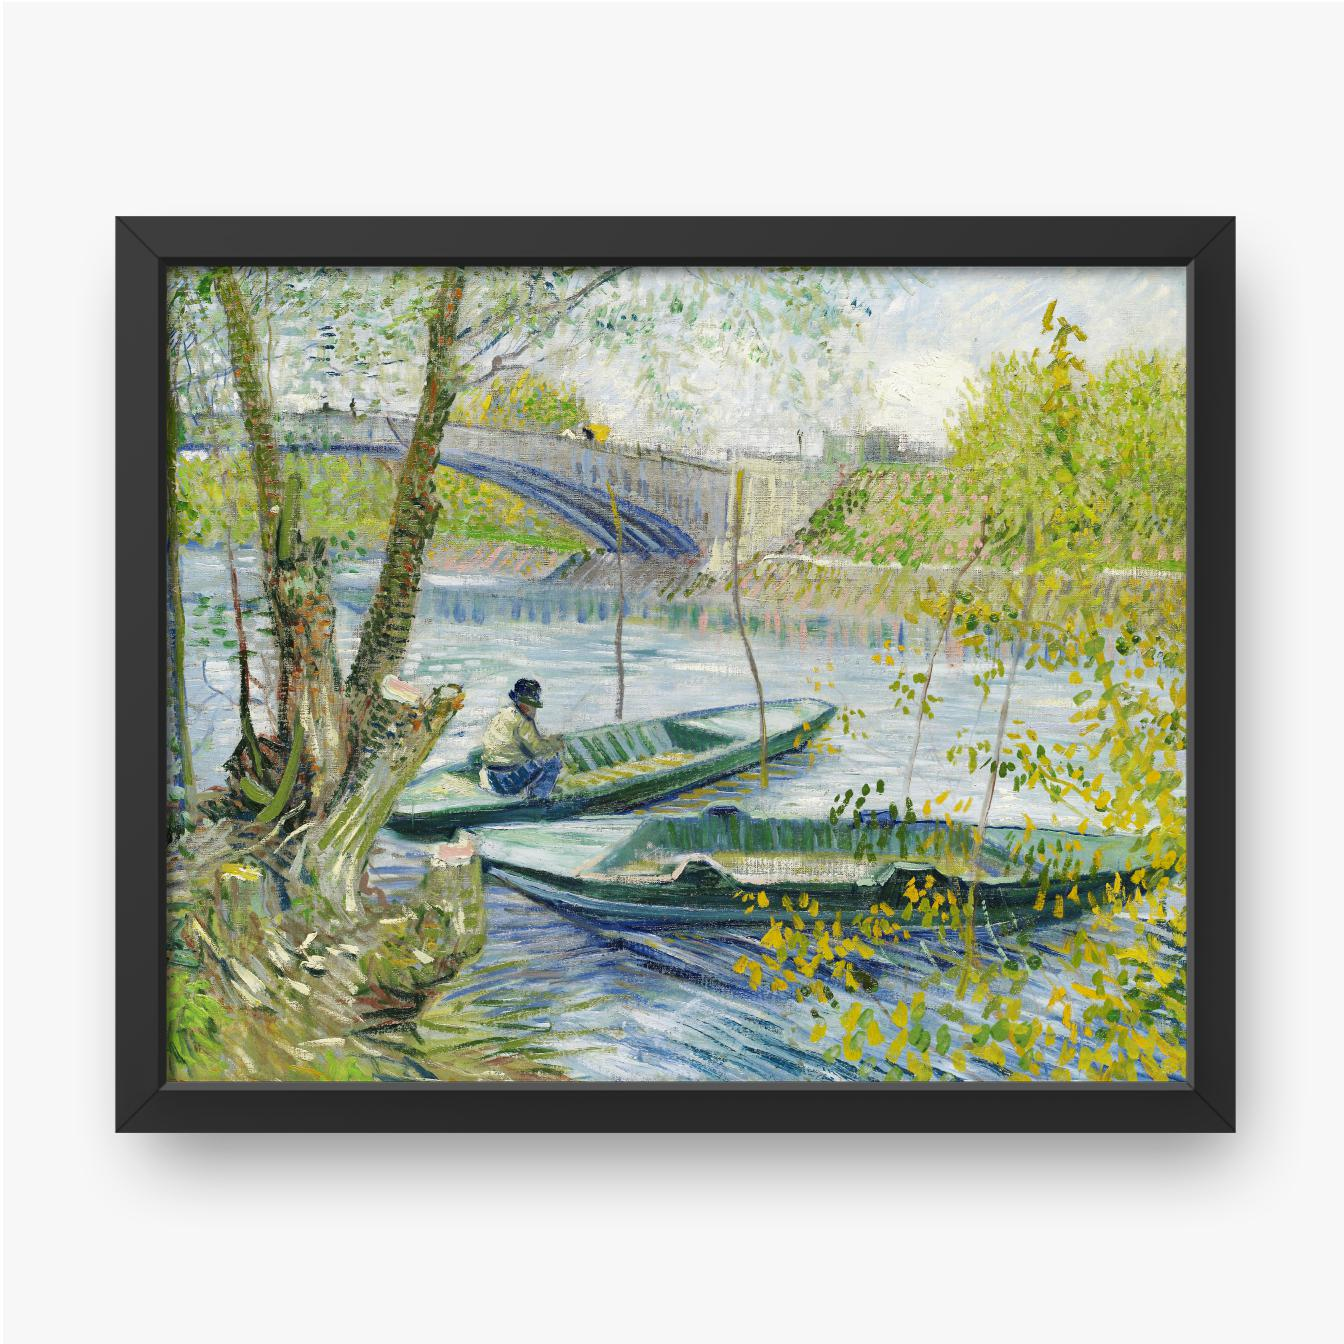 Vincent van Gogh, Angeln im Frühjahr 1889